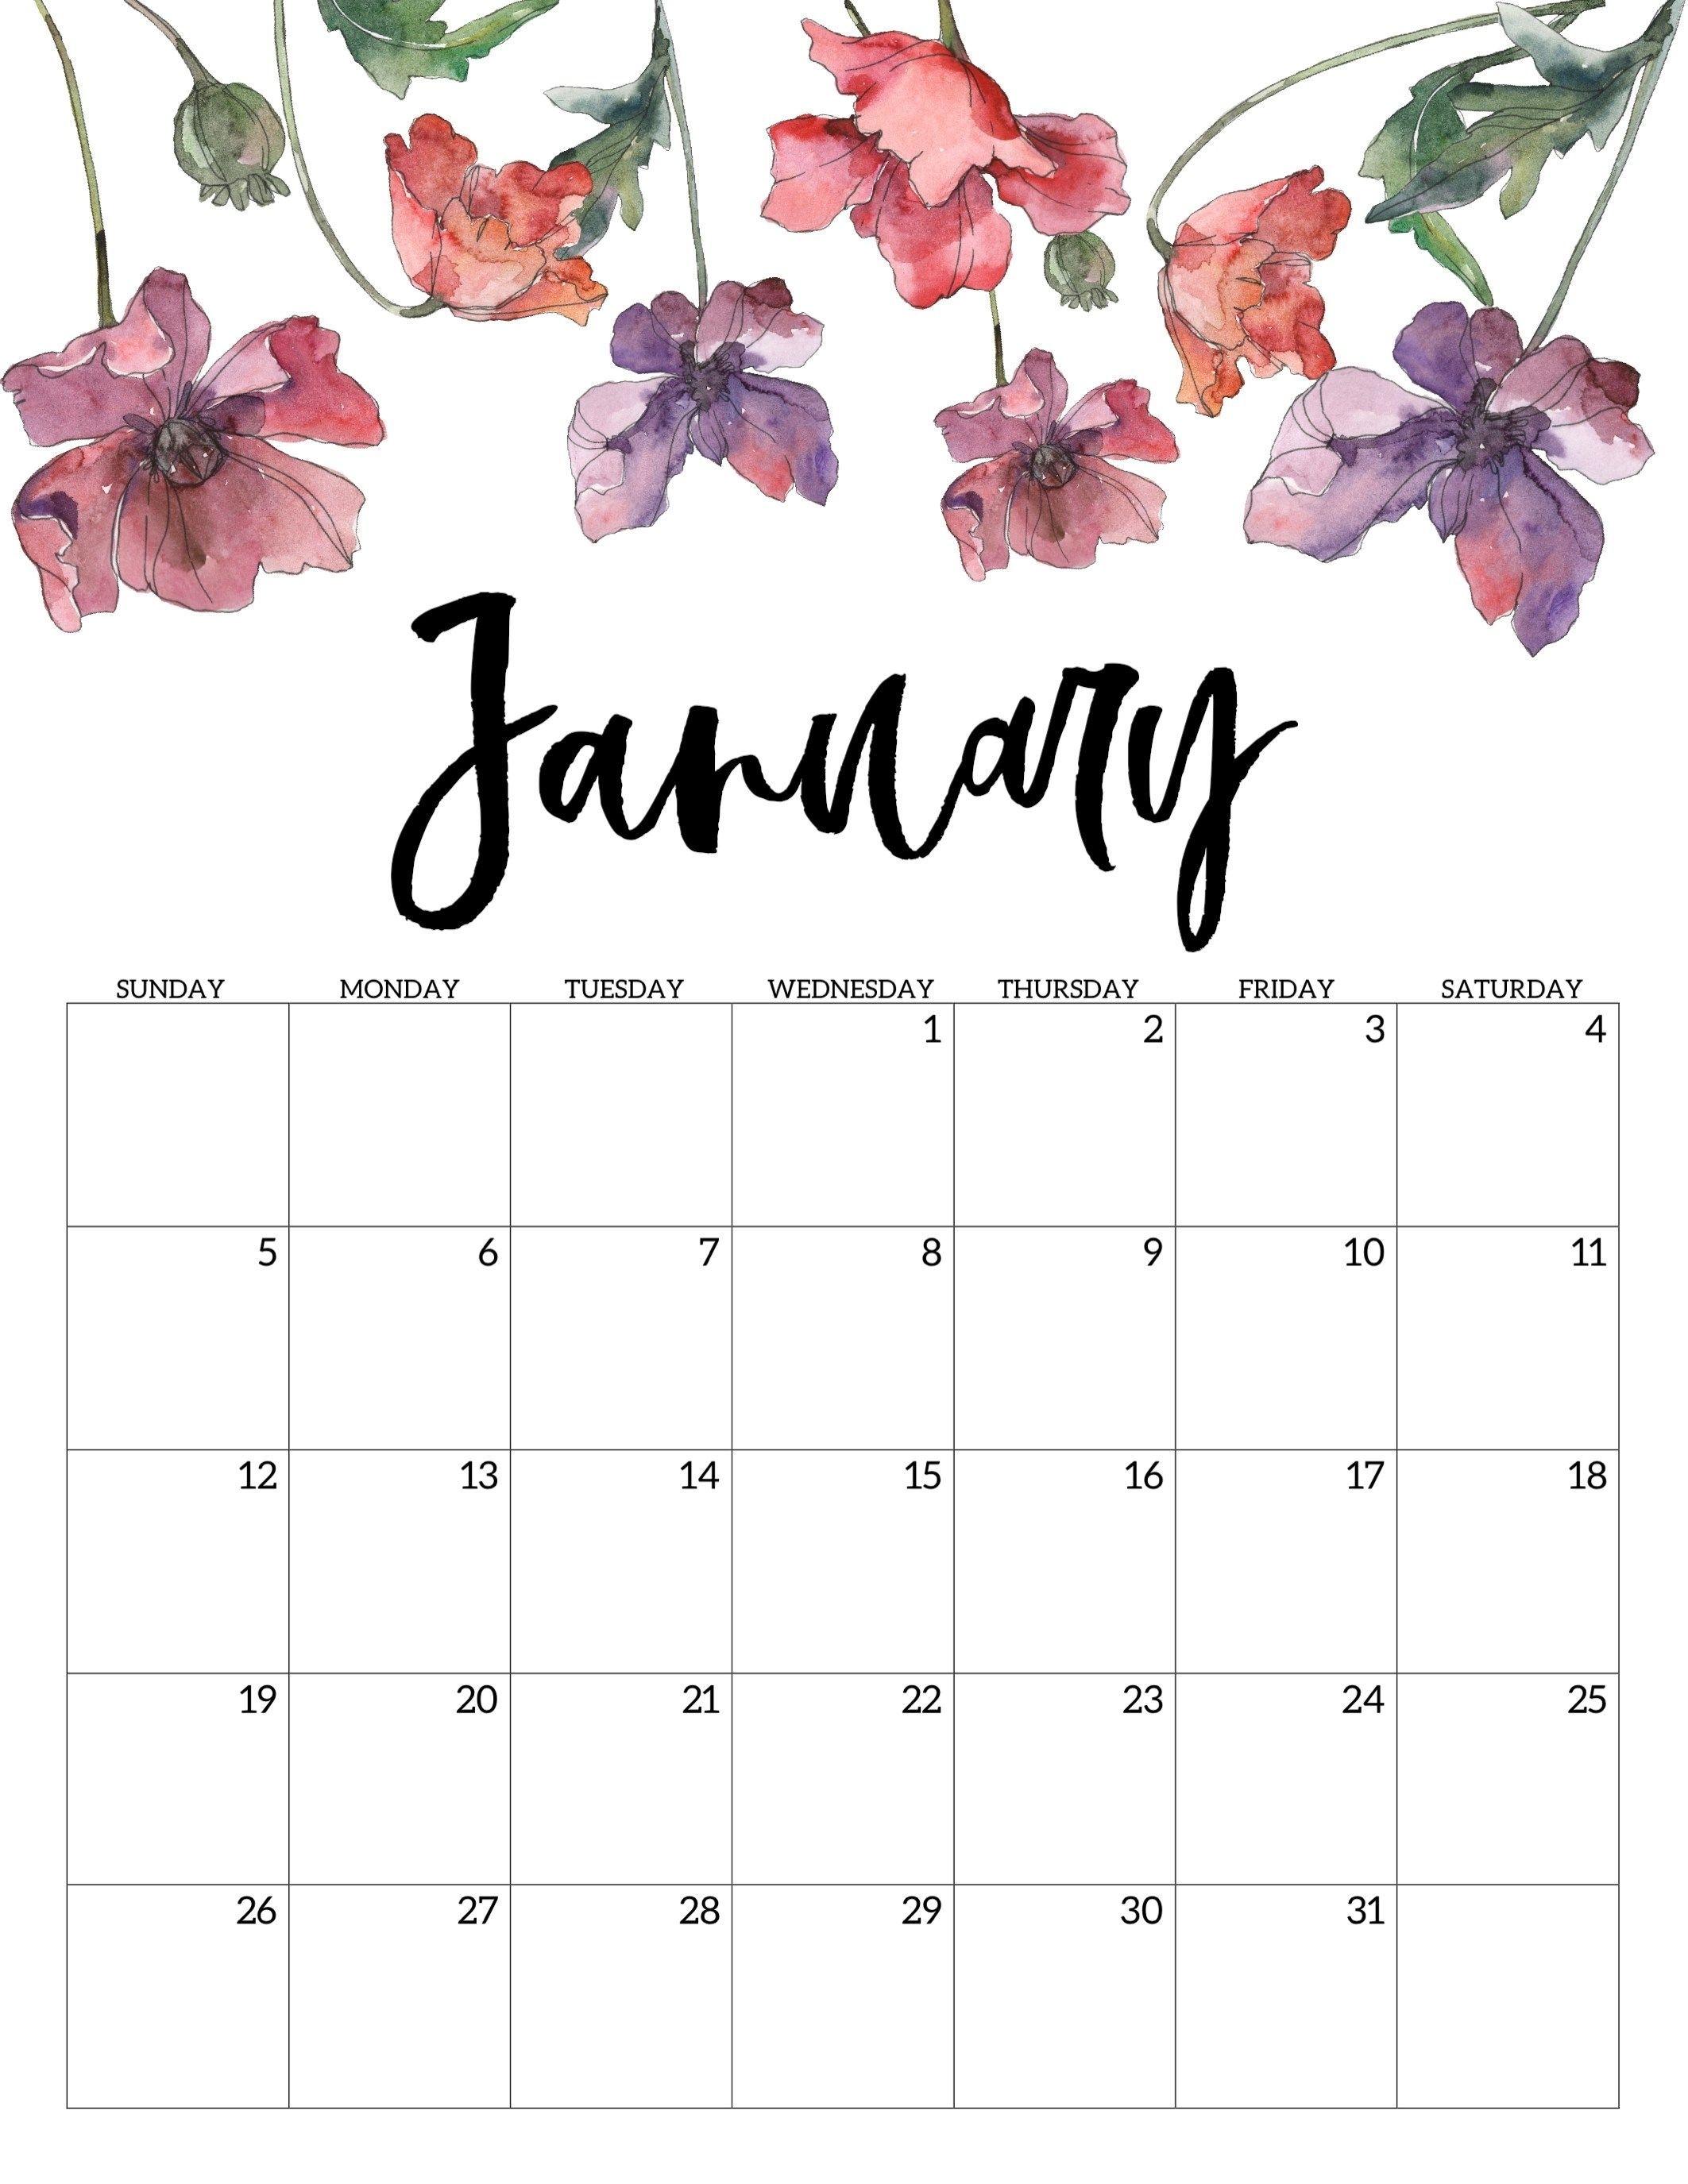 January 2020 Floral Calendar | Print Calendar, Free